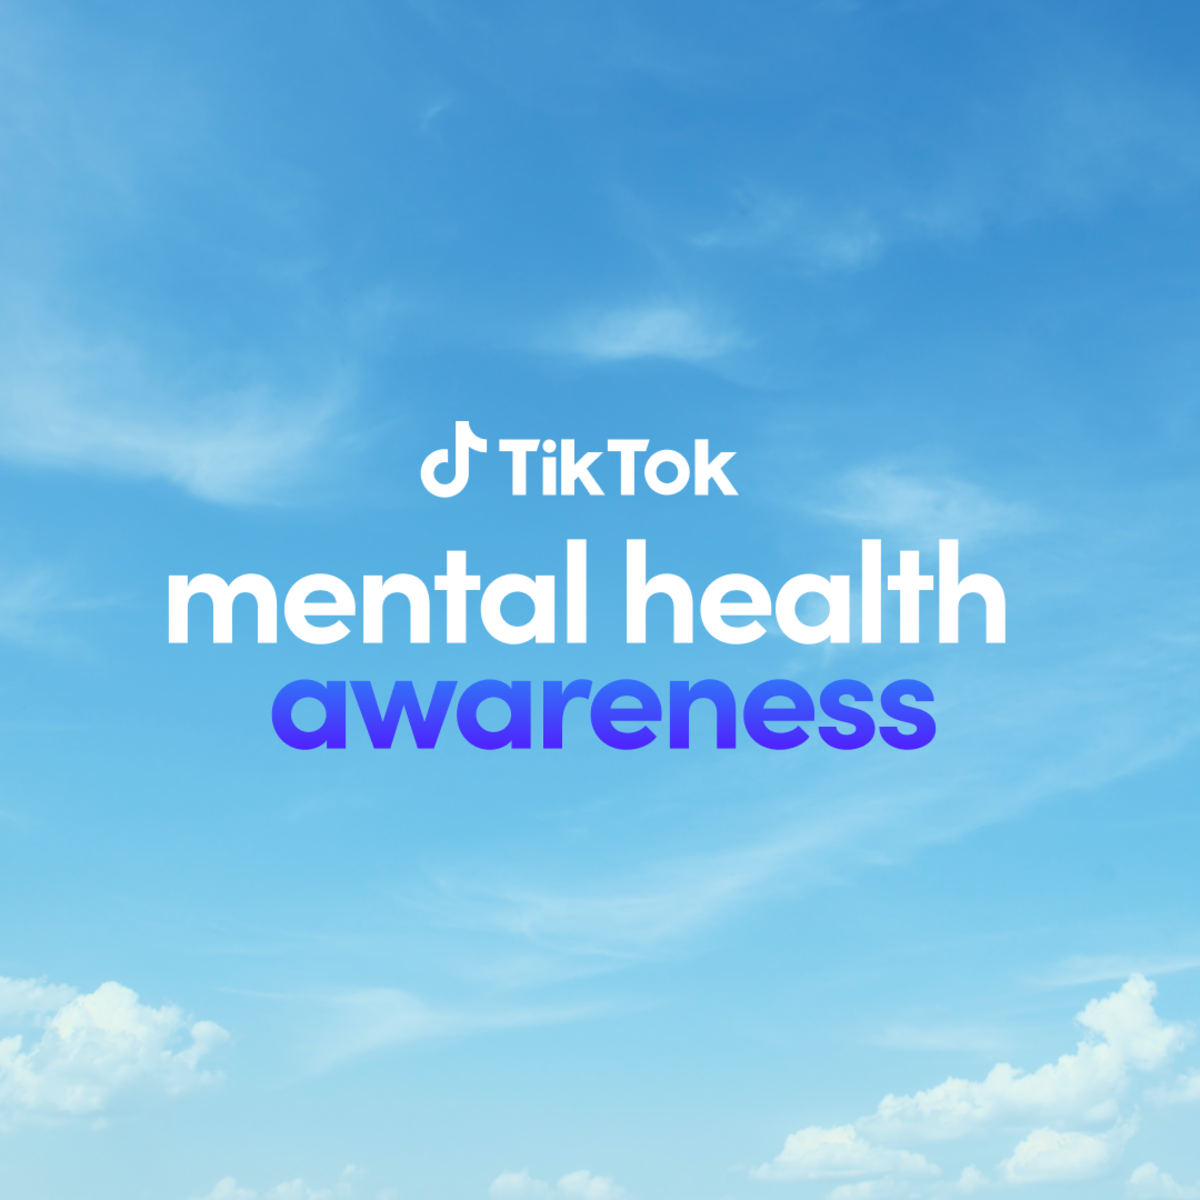 TikTok Mental Health Awareness